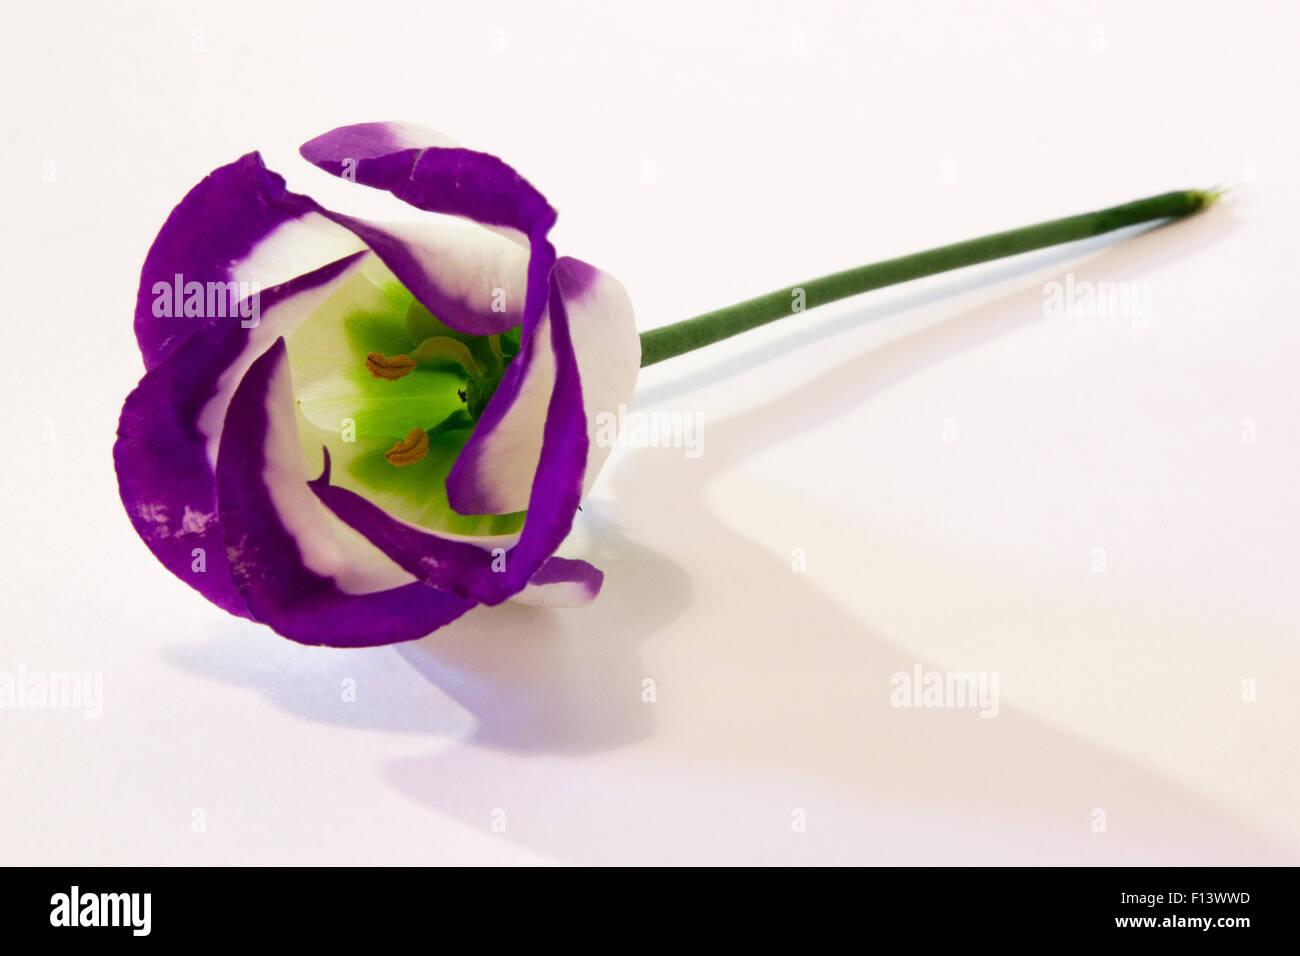 Blue Lisianthus Flower.  A single lisianthus flower on a white background. - Stock Image